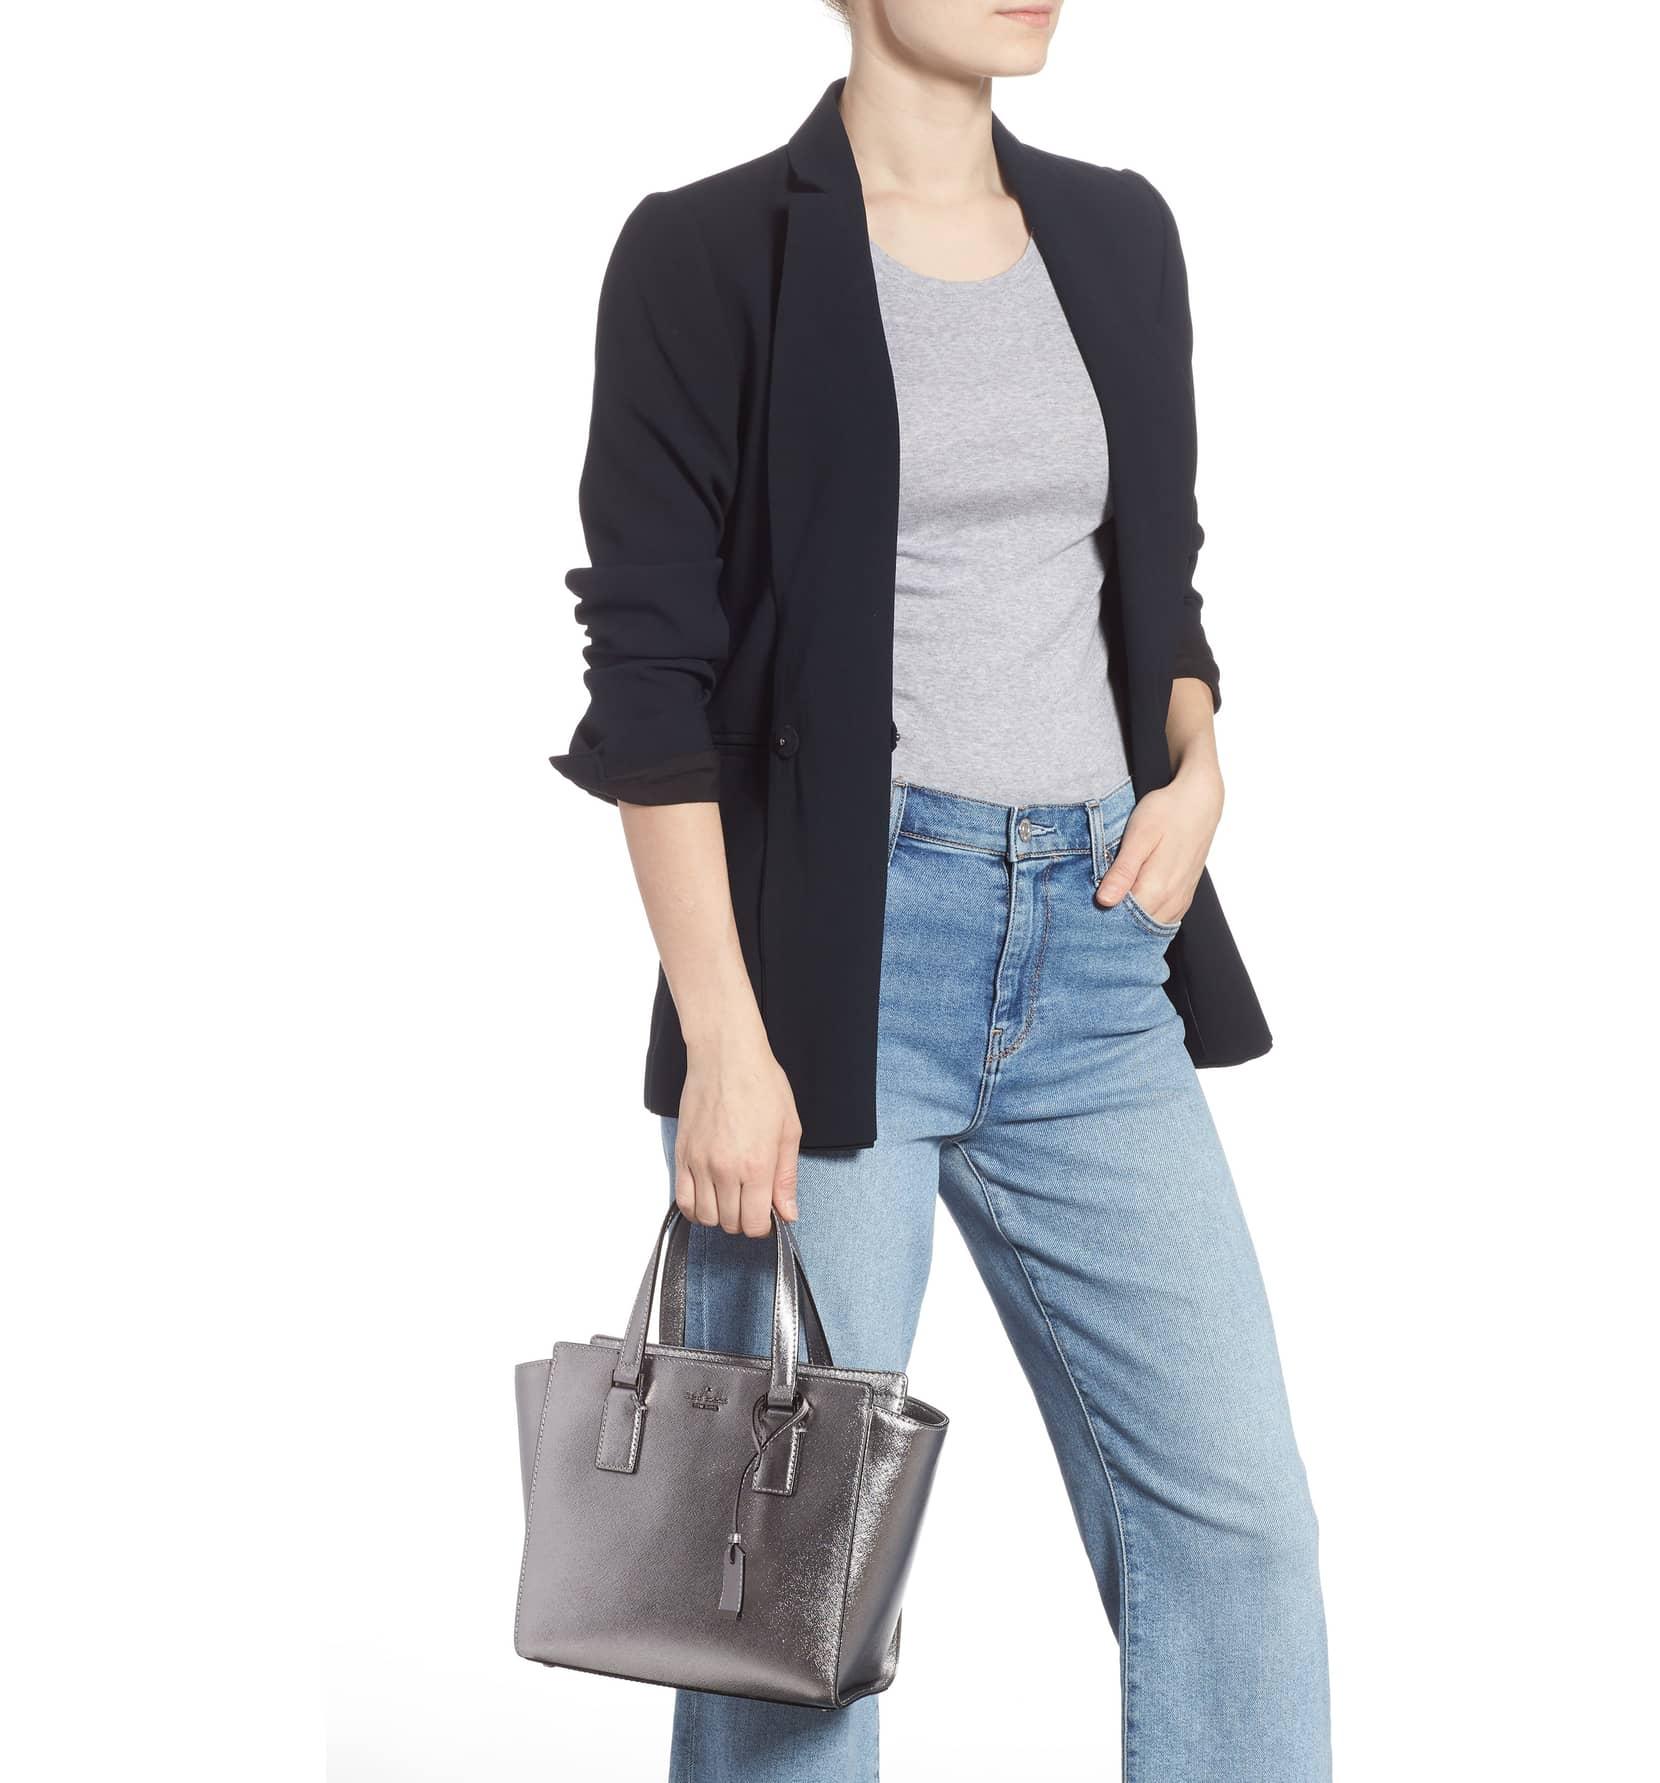 kate spade metallic leather satchel held by a model